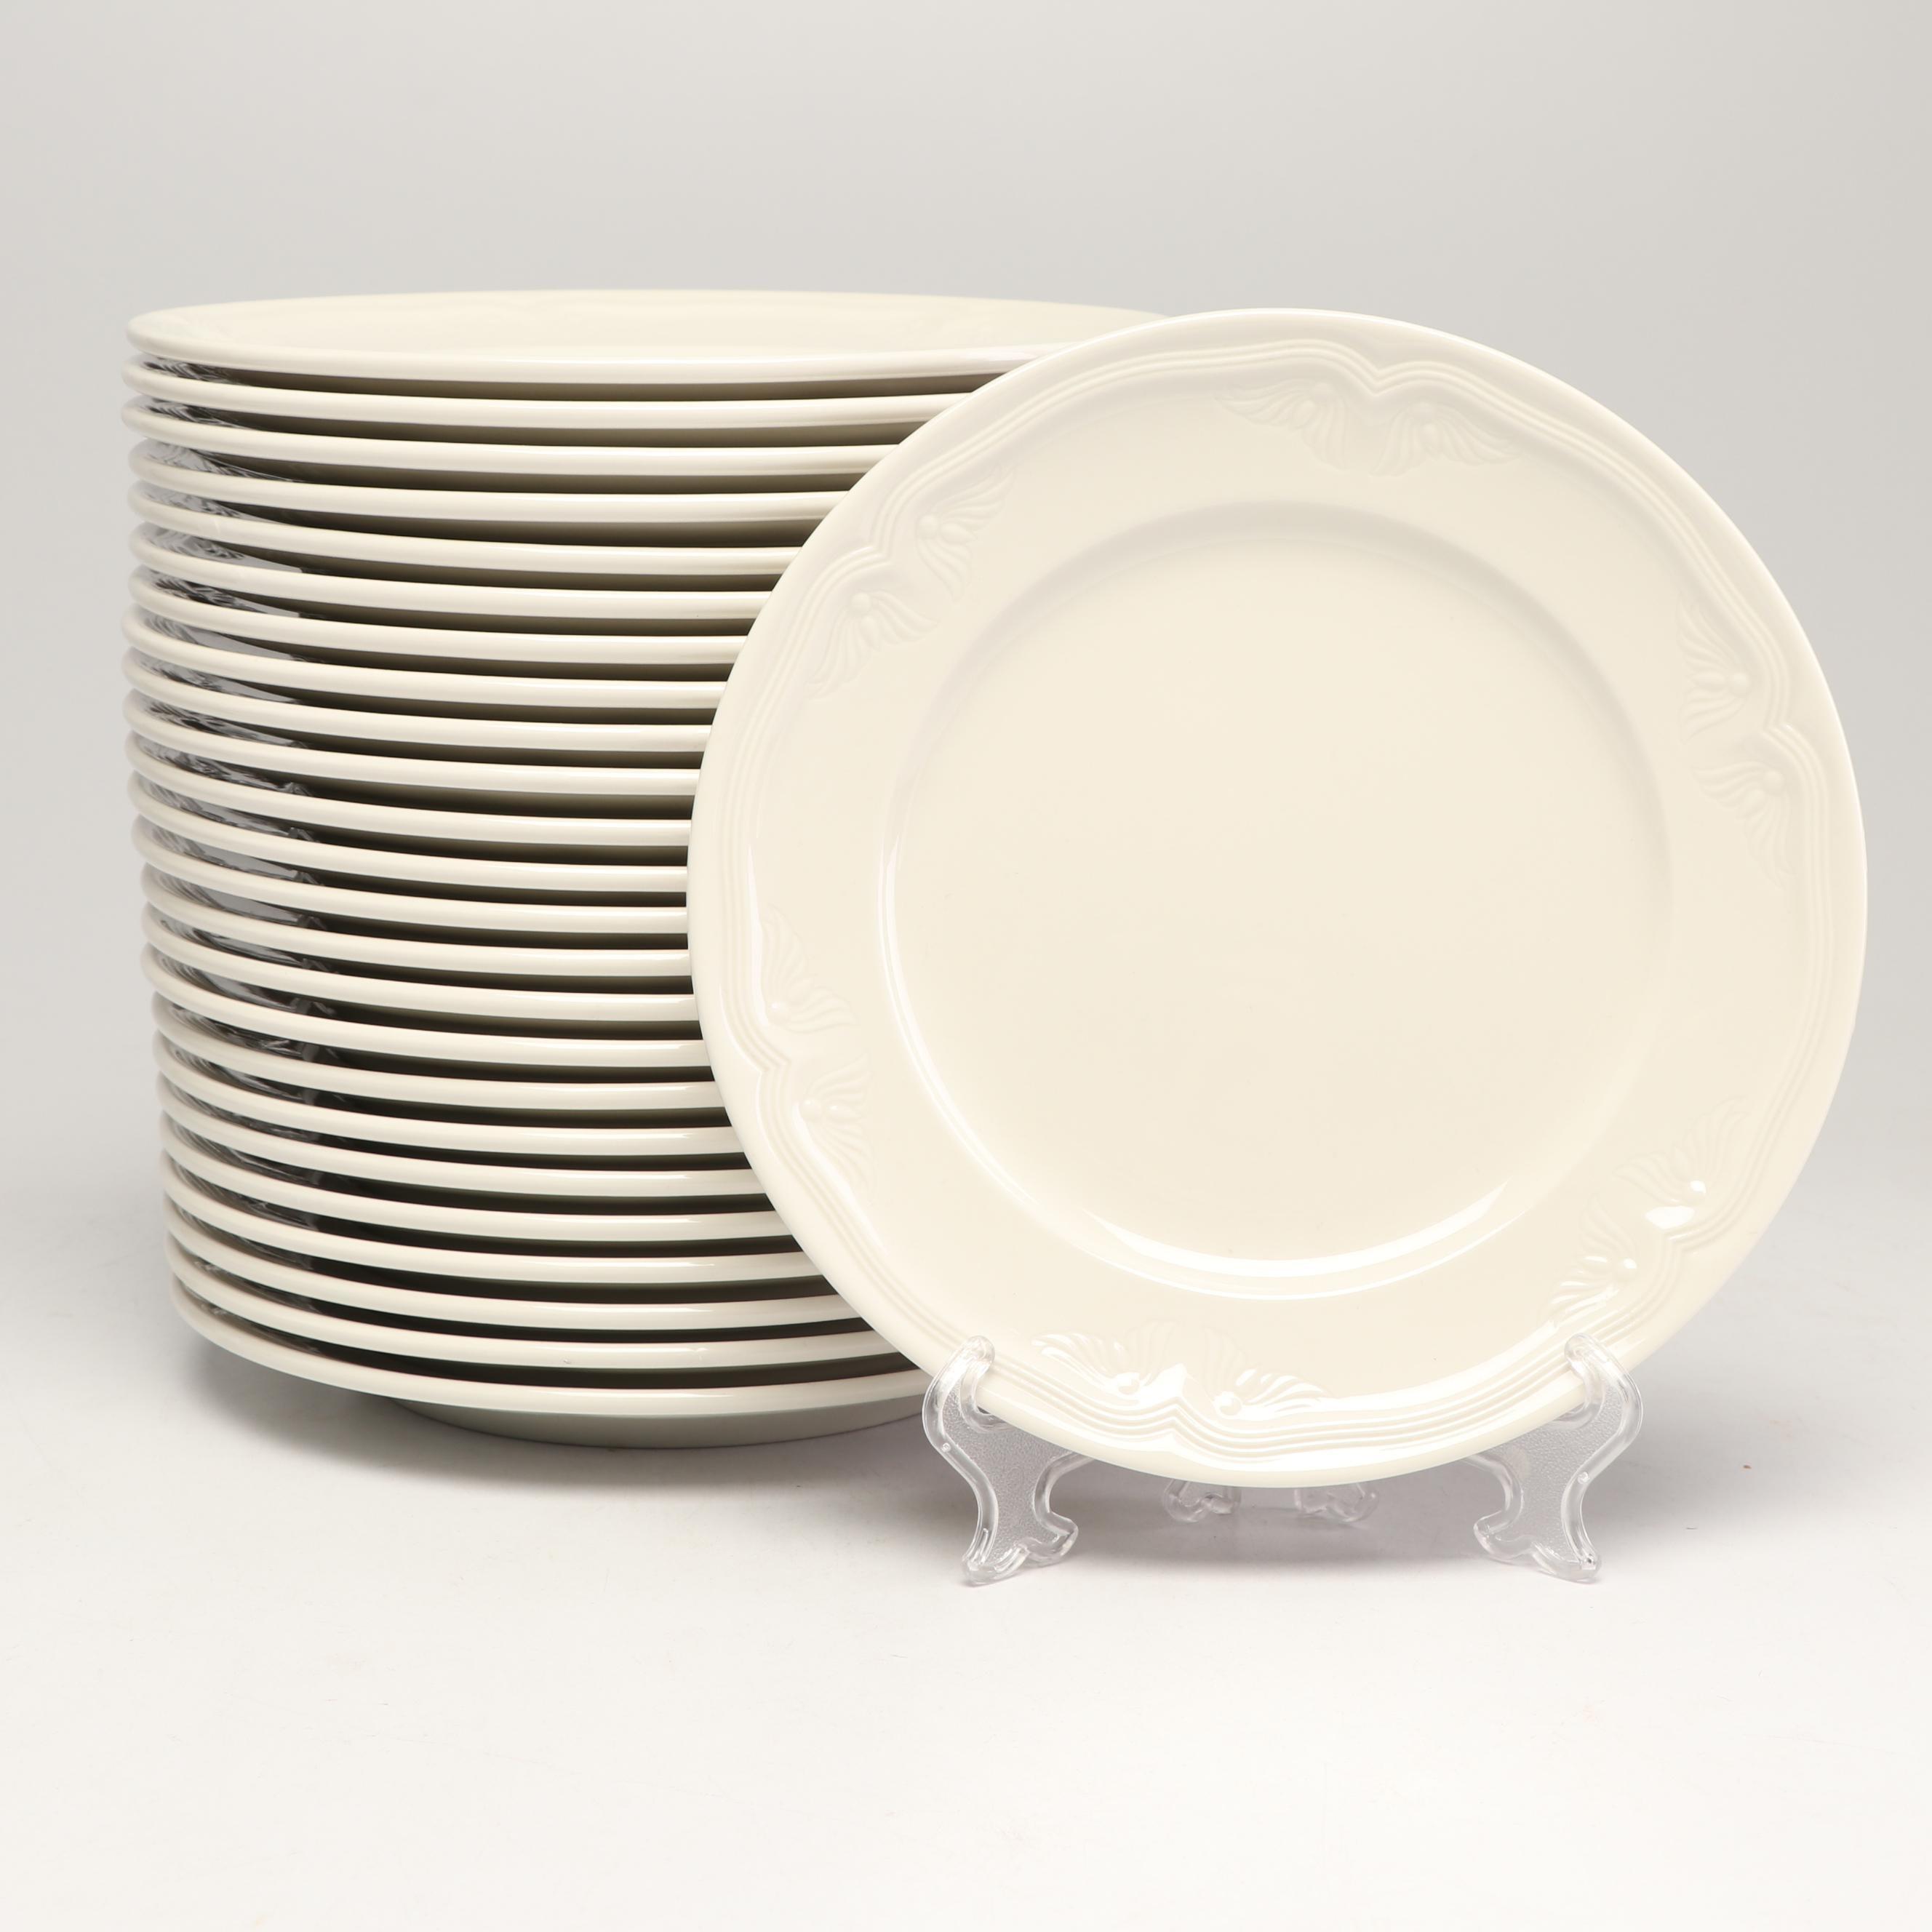 "Villeroy & Boch ""Cortina"" Porcelain Salad Plates, Late 20th Century"